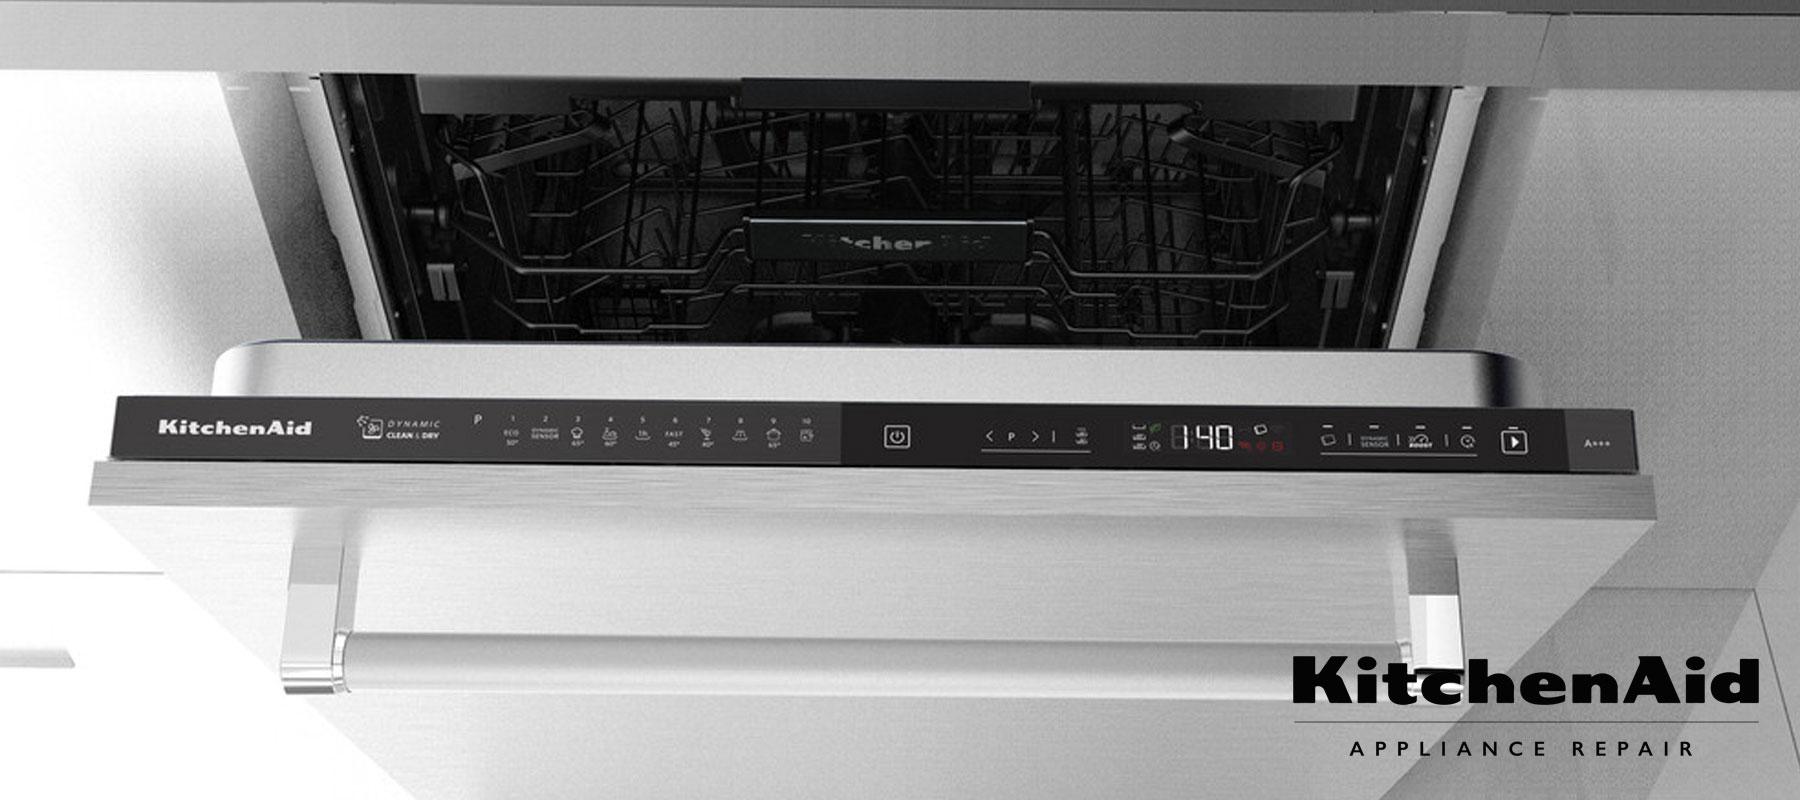 When To Have KitchenAid Dishwasher Repair Done | KitchenAid Appliance Repair Professionals